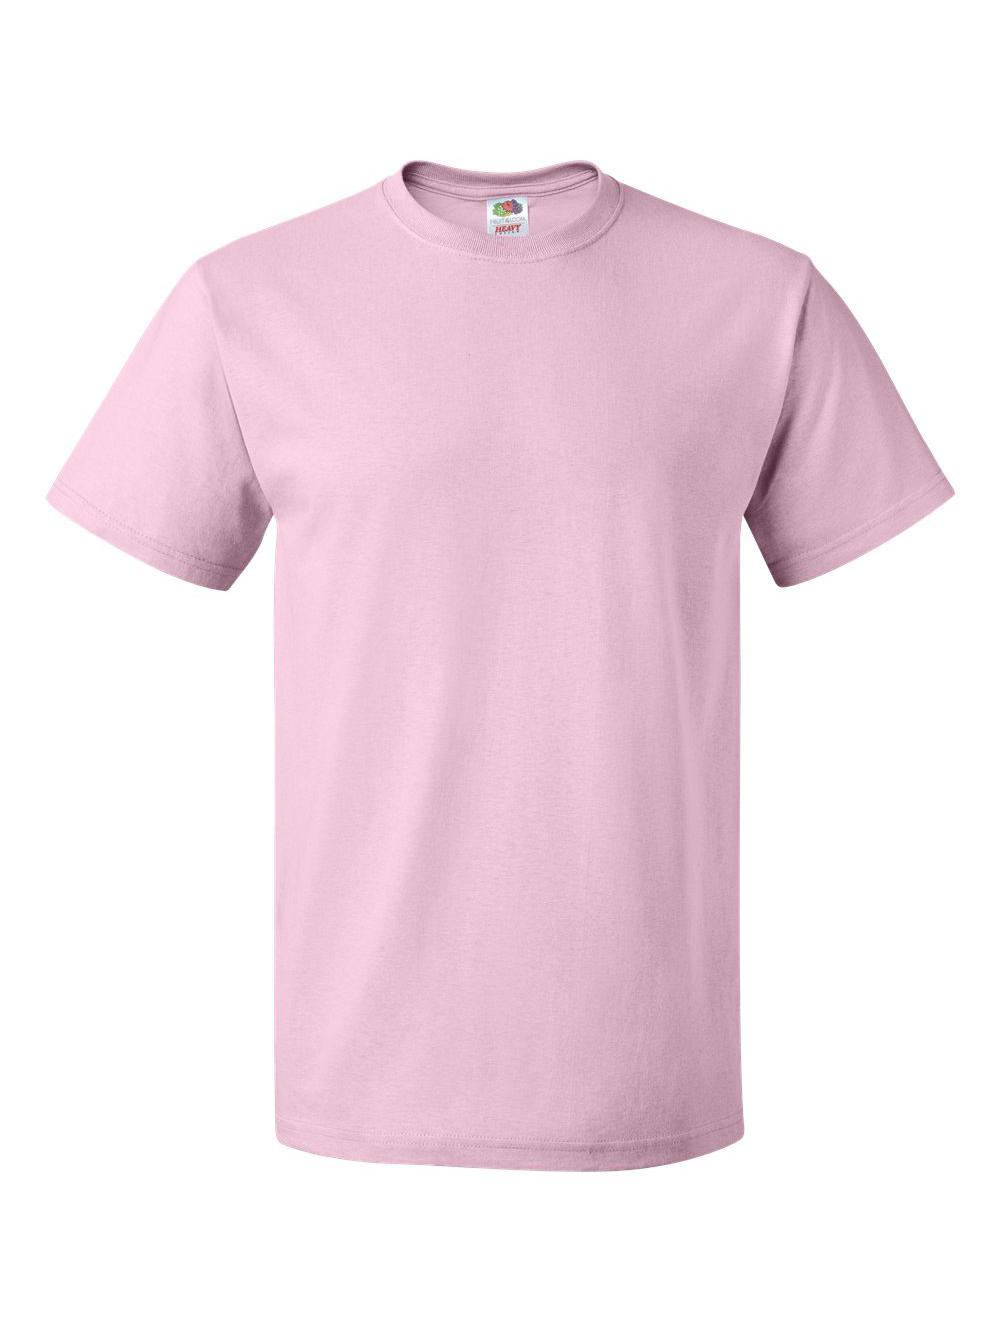 Fruit-of-the-Loom-HD-Cotton-Short-Sleeve-T-Shirt-3930R thumbnail 30